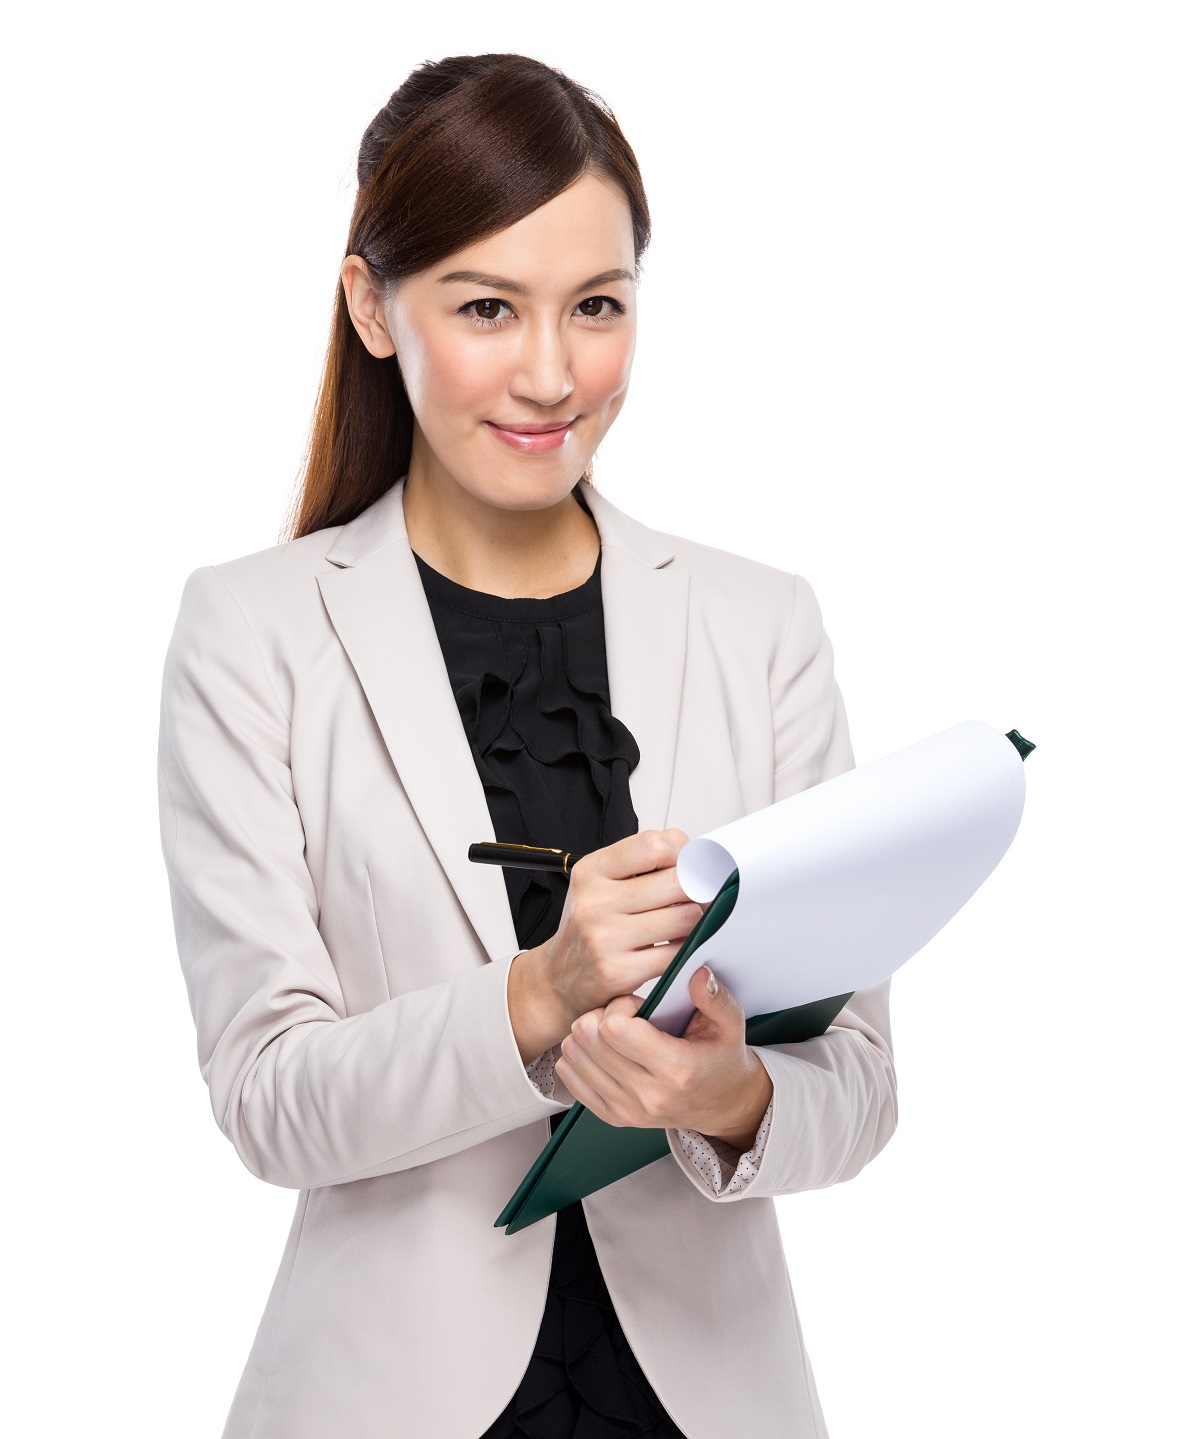 Auditing Software Platform for quick onsite auditing and formal audit programme management